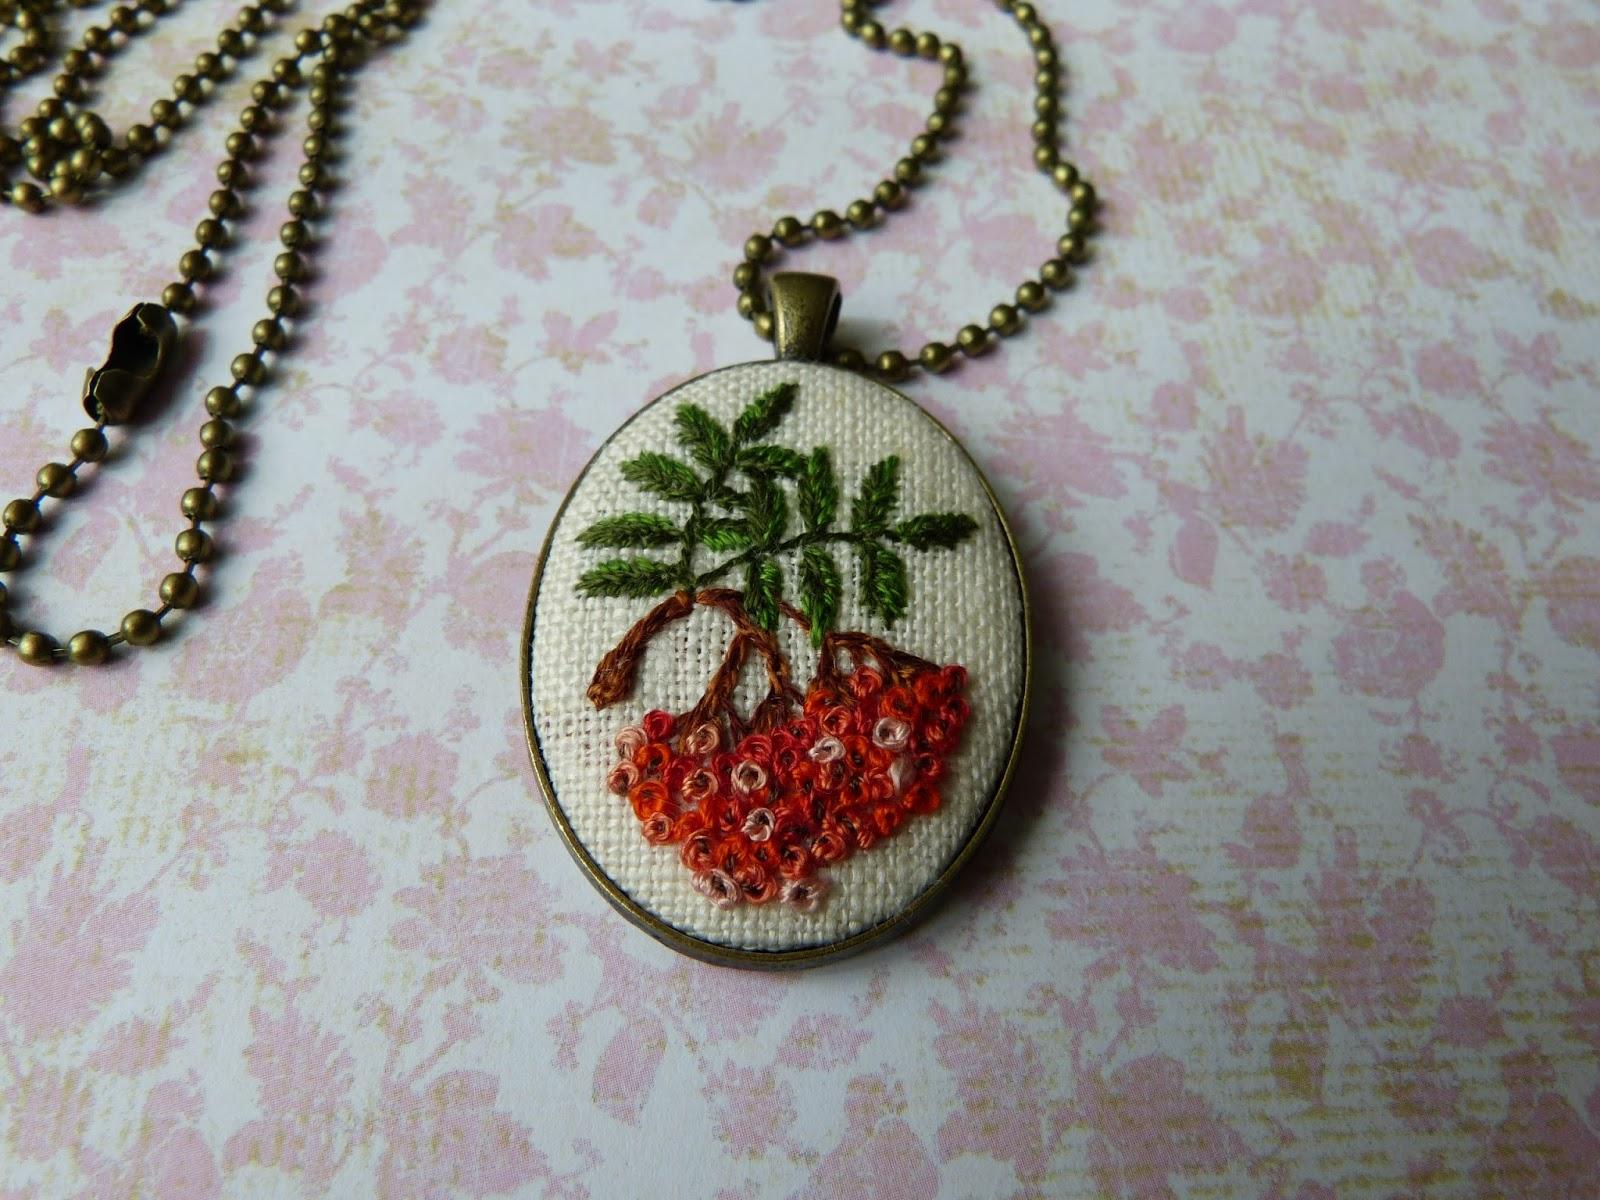 haftowana biżuteria, handmade jewerly, ebbroidered jewerly, broszka z haftem, embroidered pendant, embroidered brooch